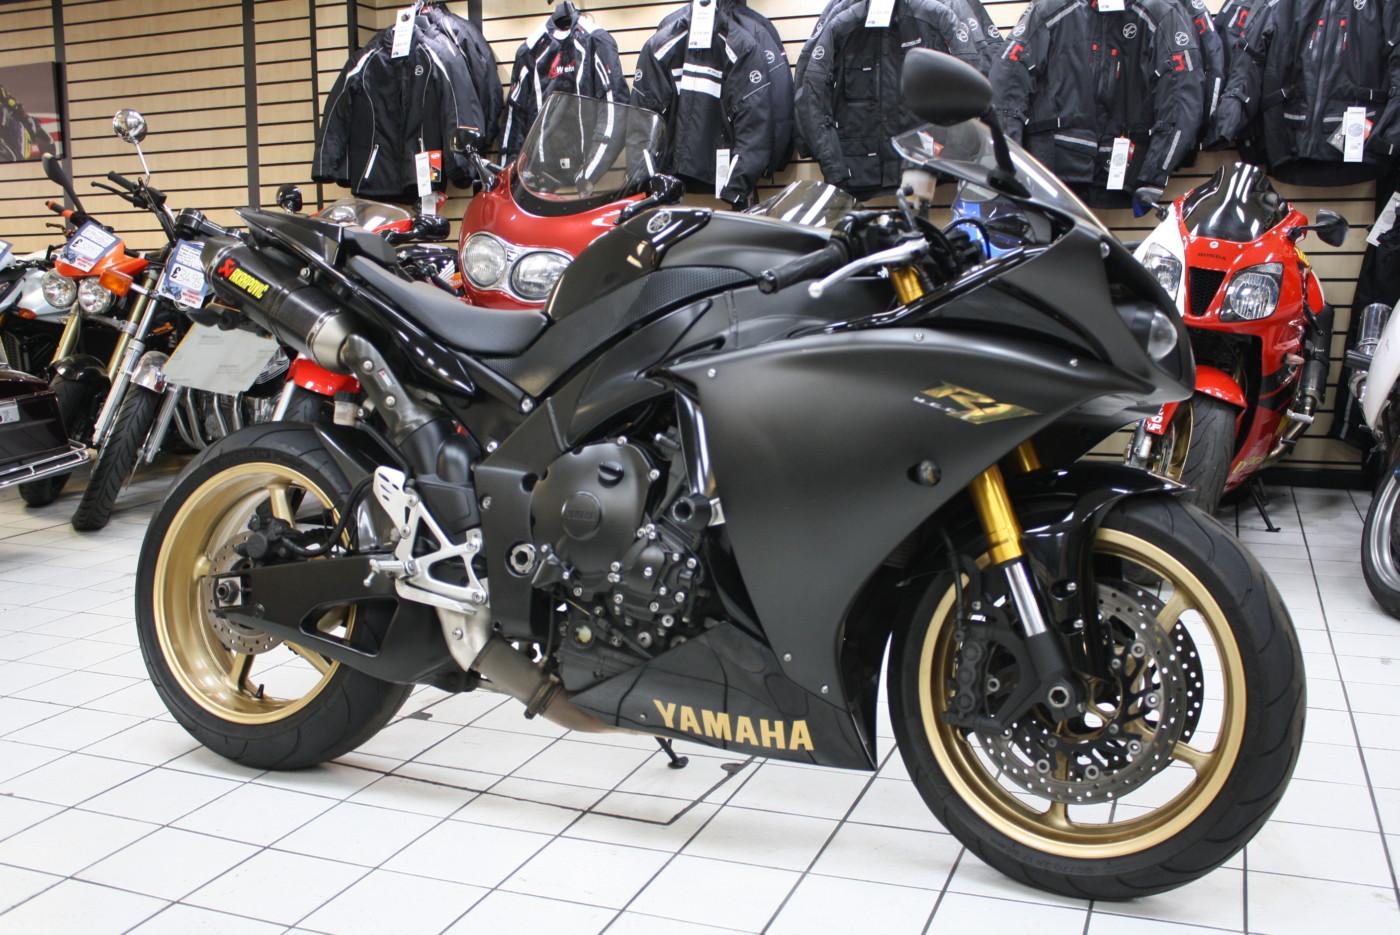 Yamaha YZF R1 Big Bang Black